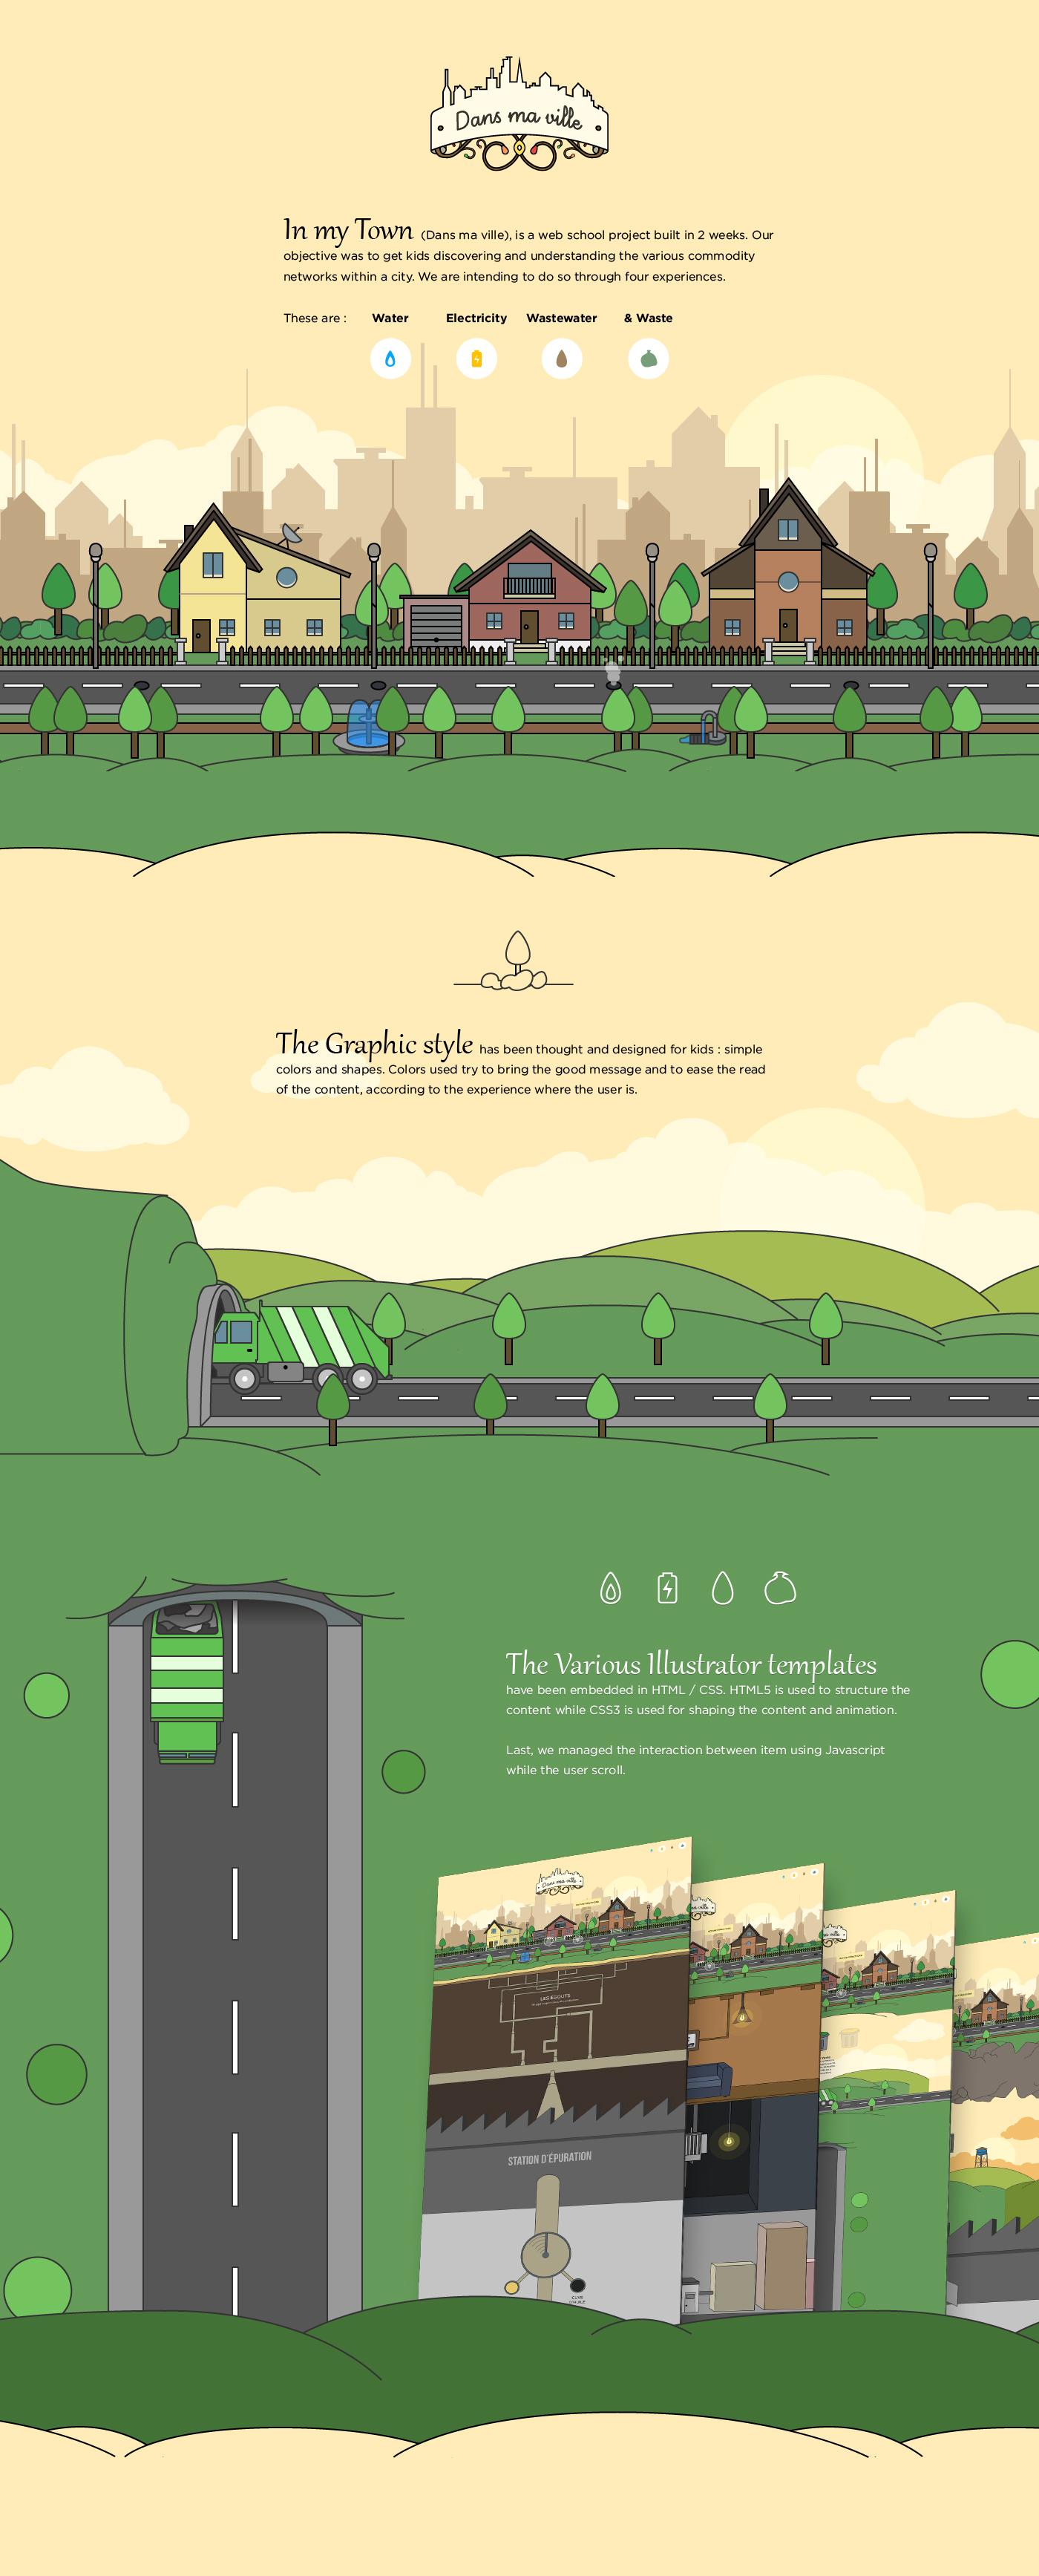 illustrations dans ma ville scroll flat design hetic prototype Ecology network city ville